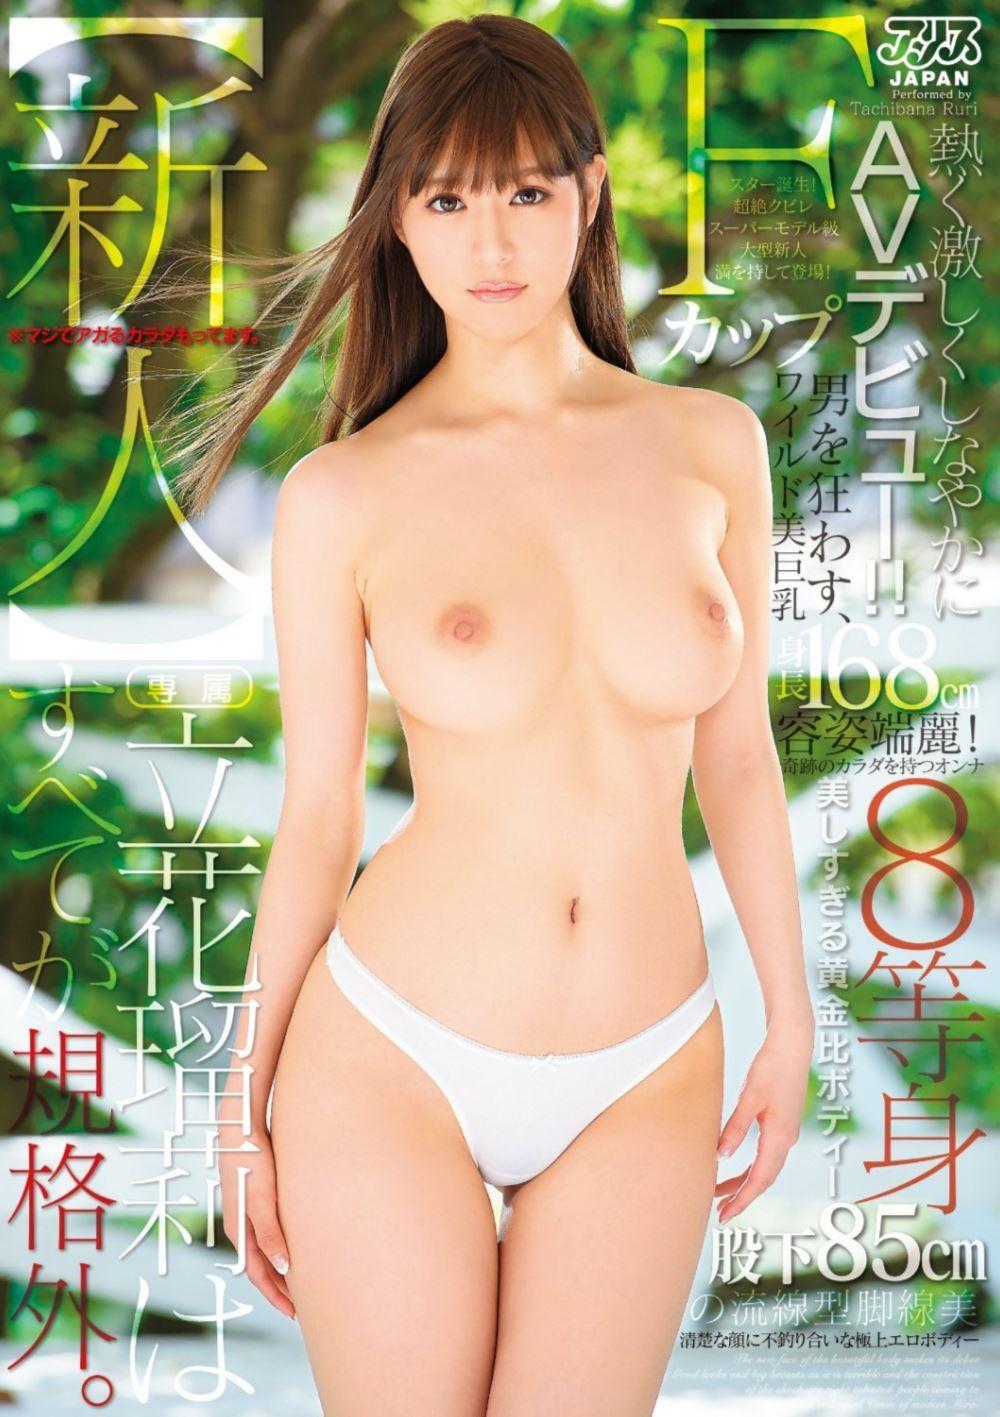 立花瑠莉 流線型脚線美 AV女優 セックス 画像 12